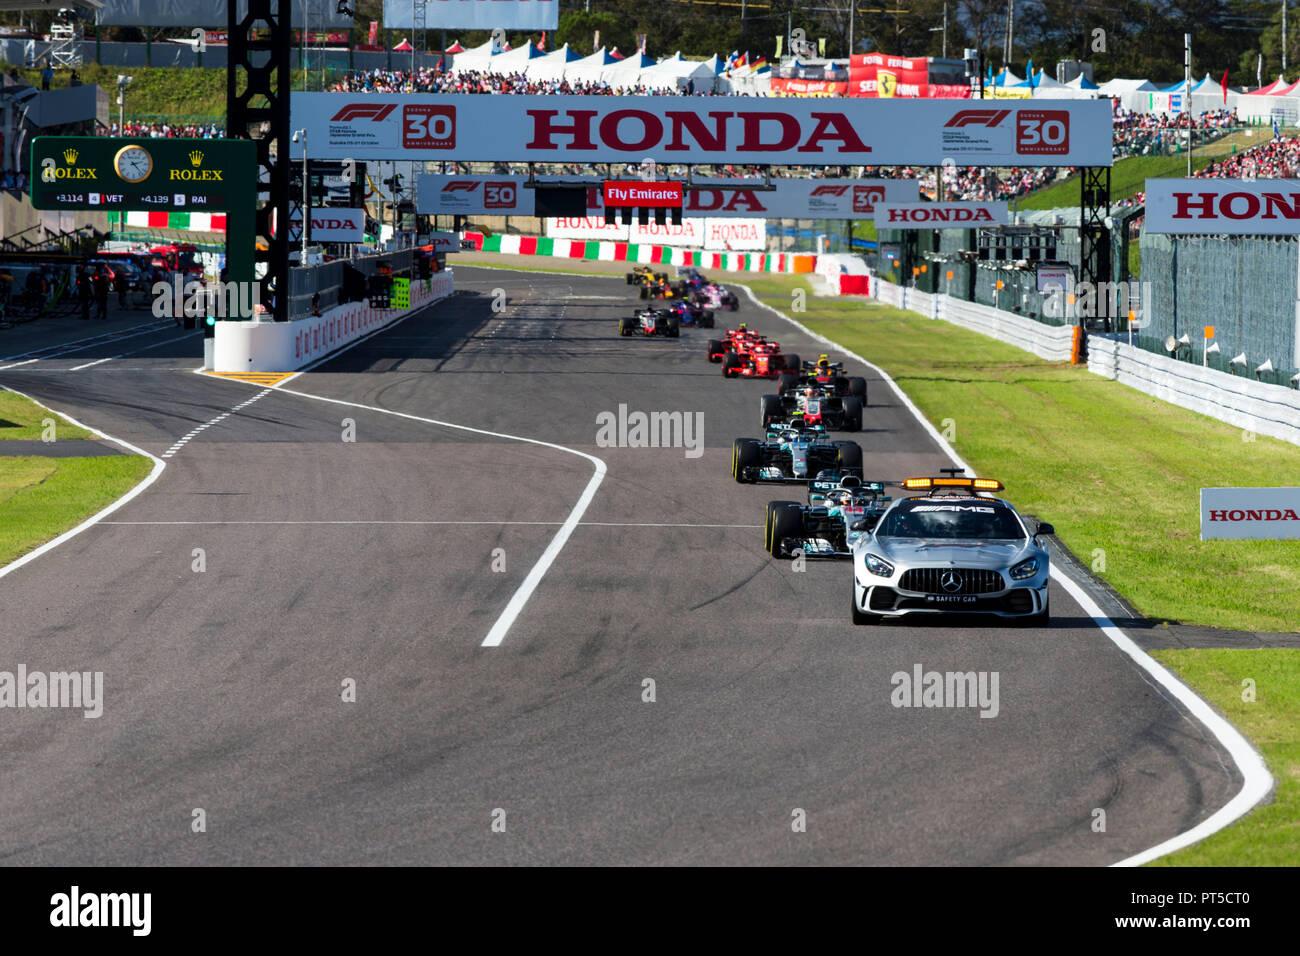 7th October 2018, Suzuka International Racing Course, Suzuka City, Japan; Formula One Grand Prix of Japan, race day; Safety car Stock Photo